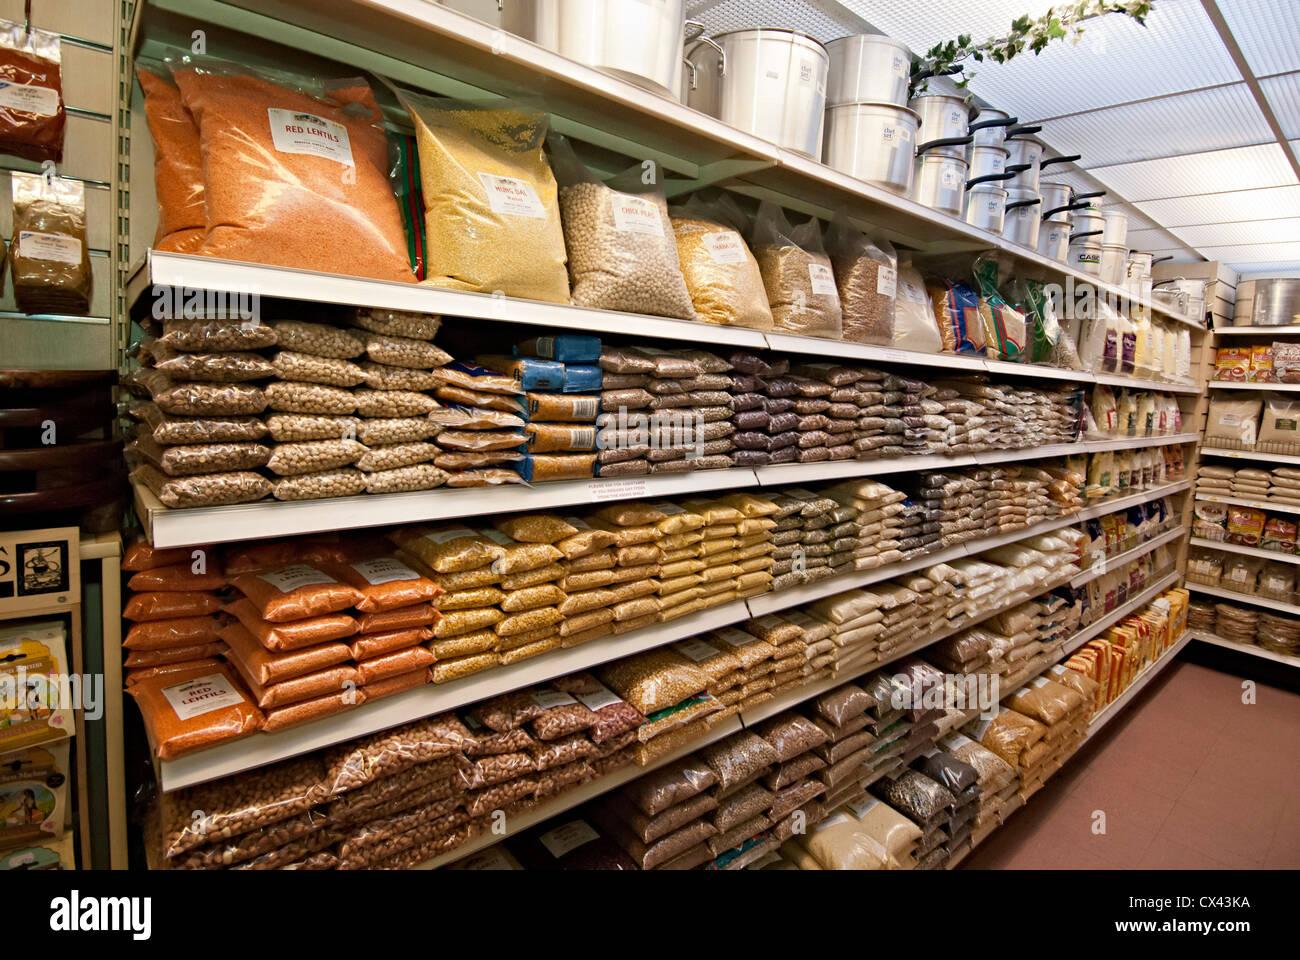 Tea Supermarket Shops Stockfotos & Tea Supermarket Shops Bilder - Alamy